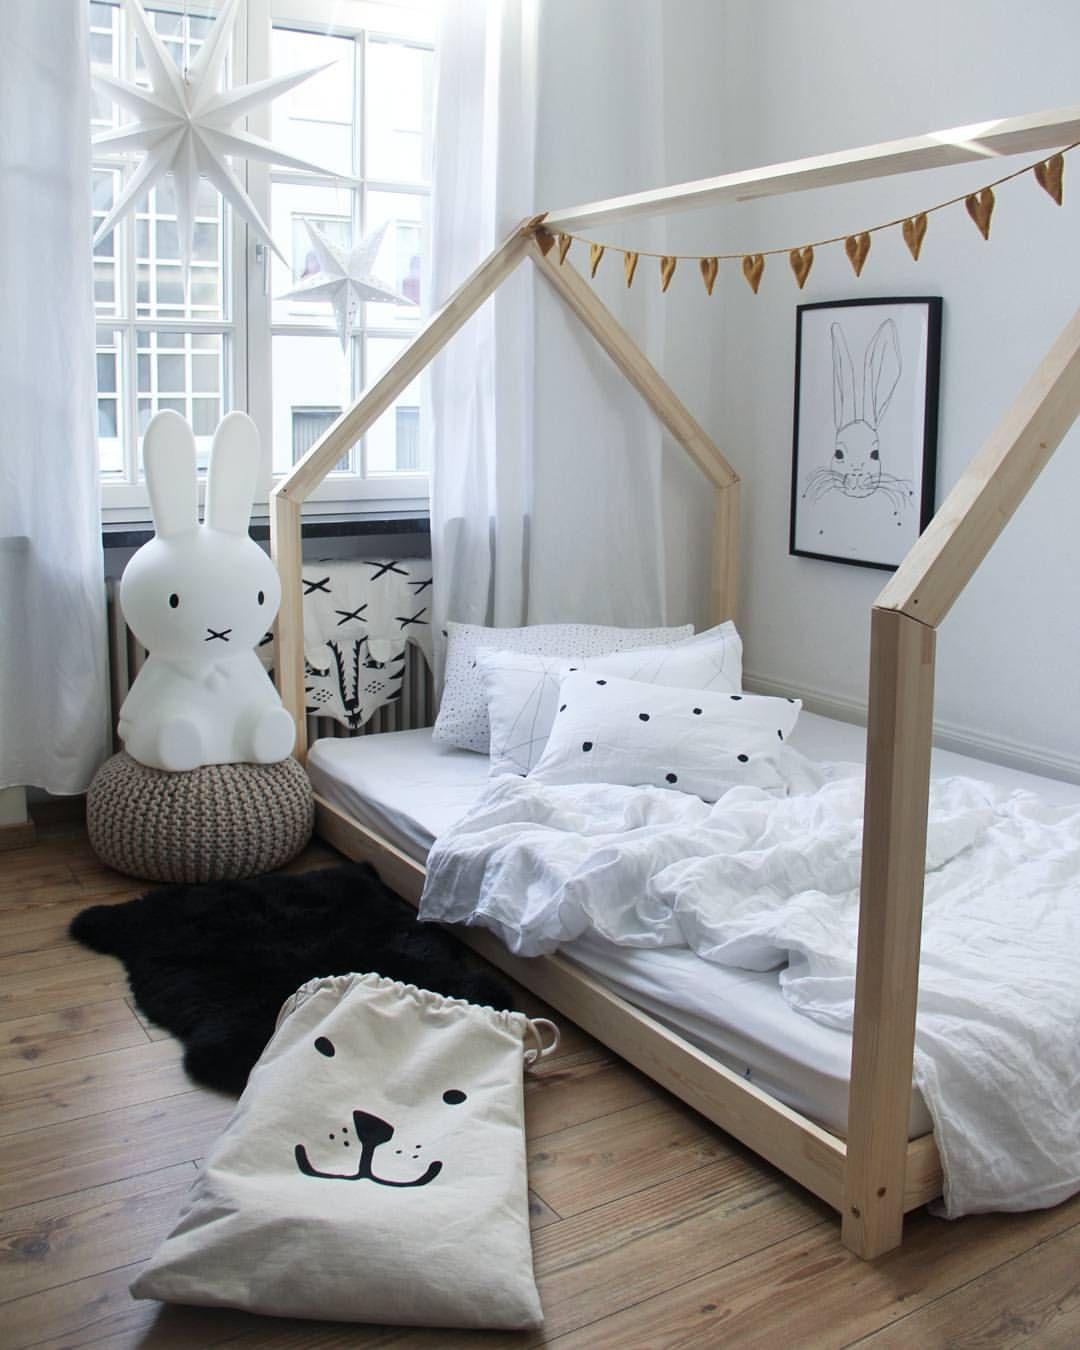 Tinkabell00 bb pinterest dormitorio bebe cama for Decoracion habitacion infantil montessori